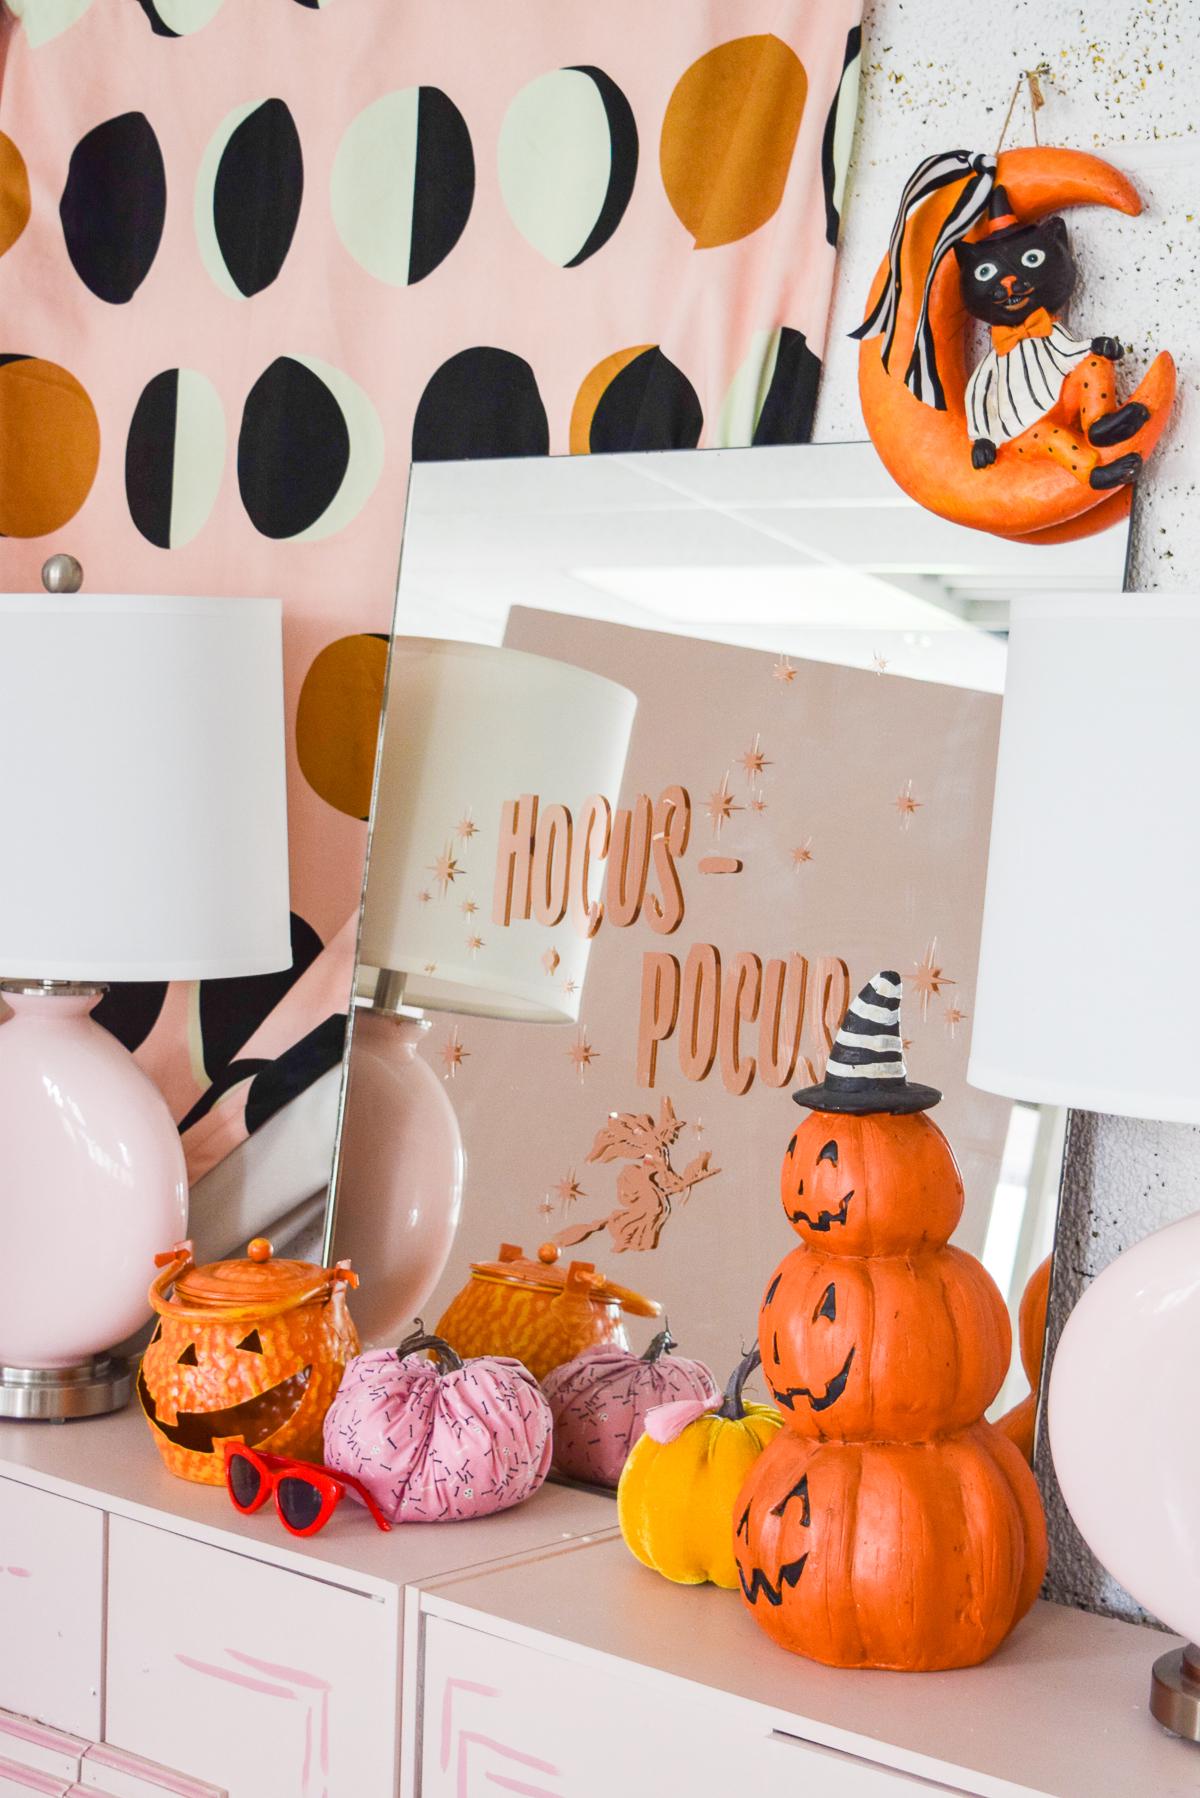 hocus pocus mirror on a pink sideboard